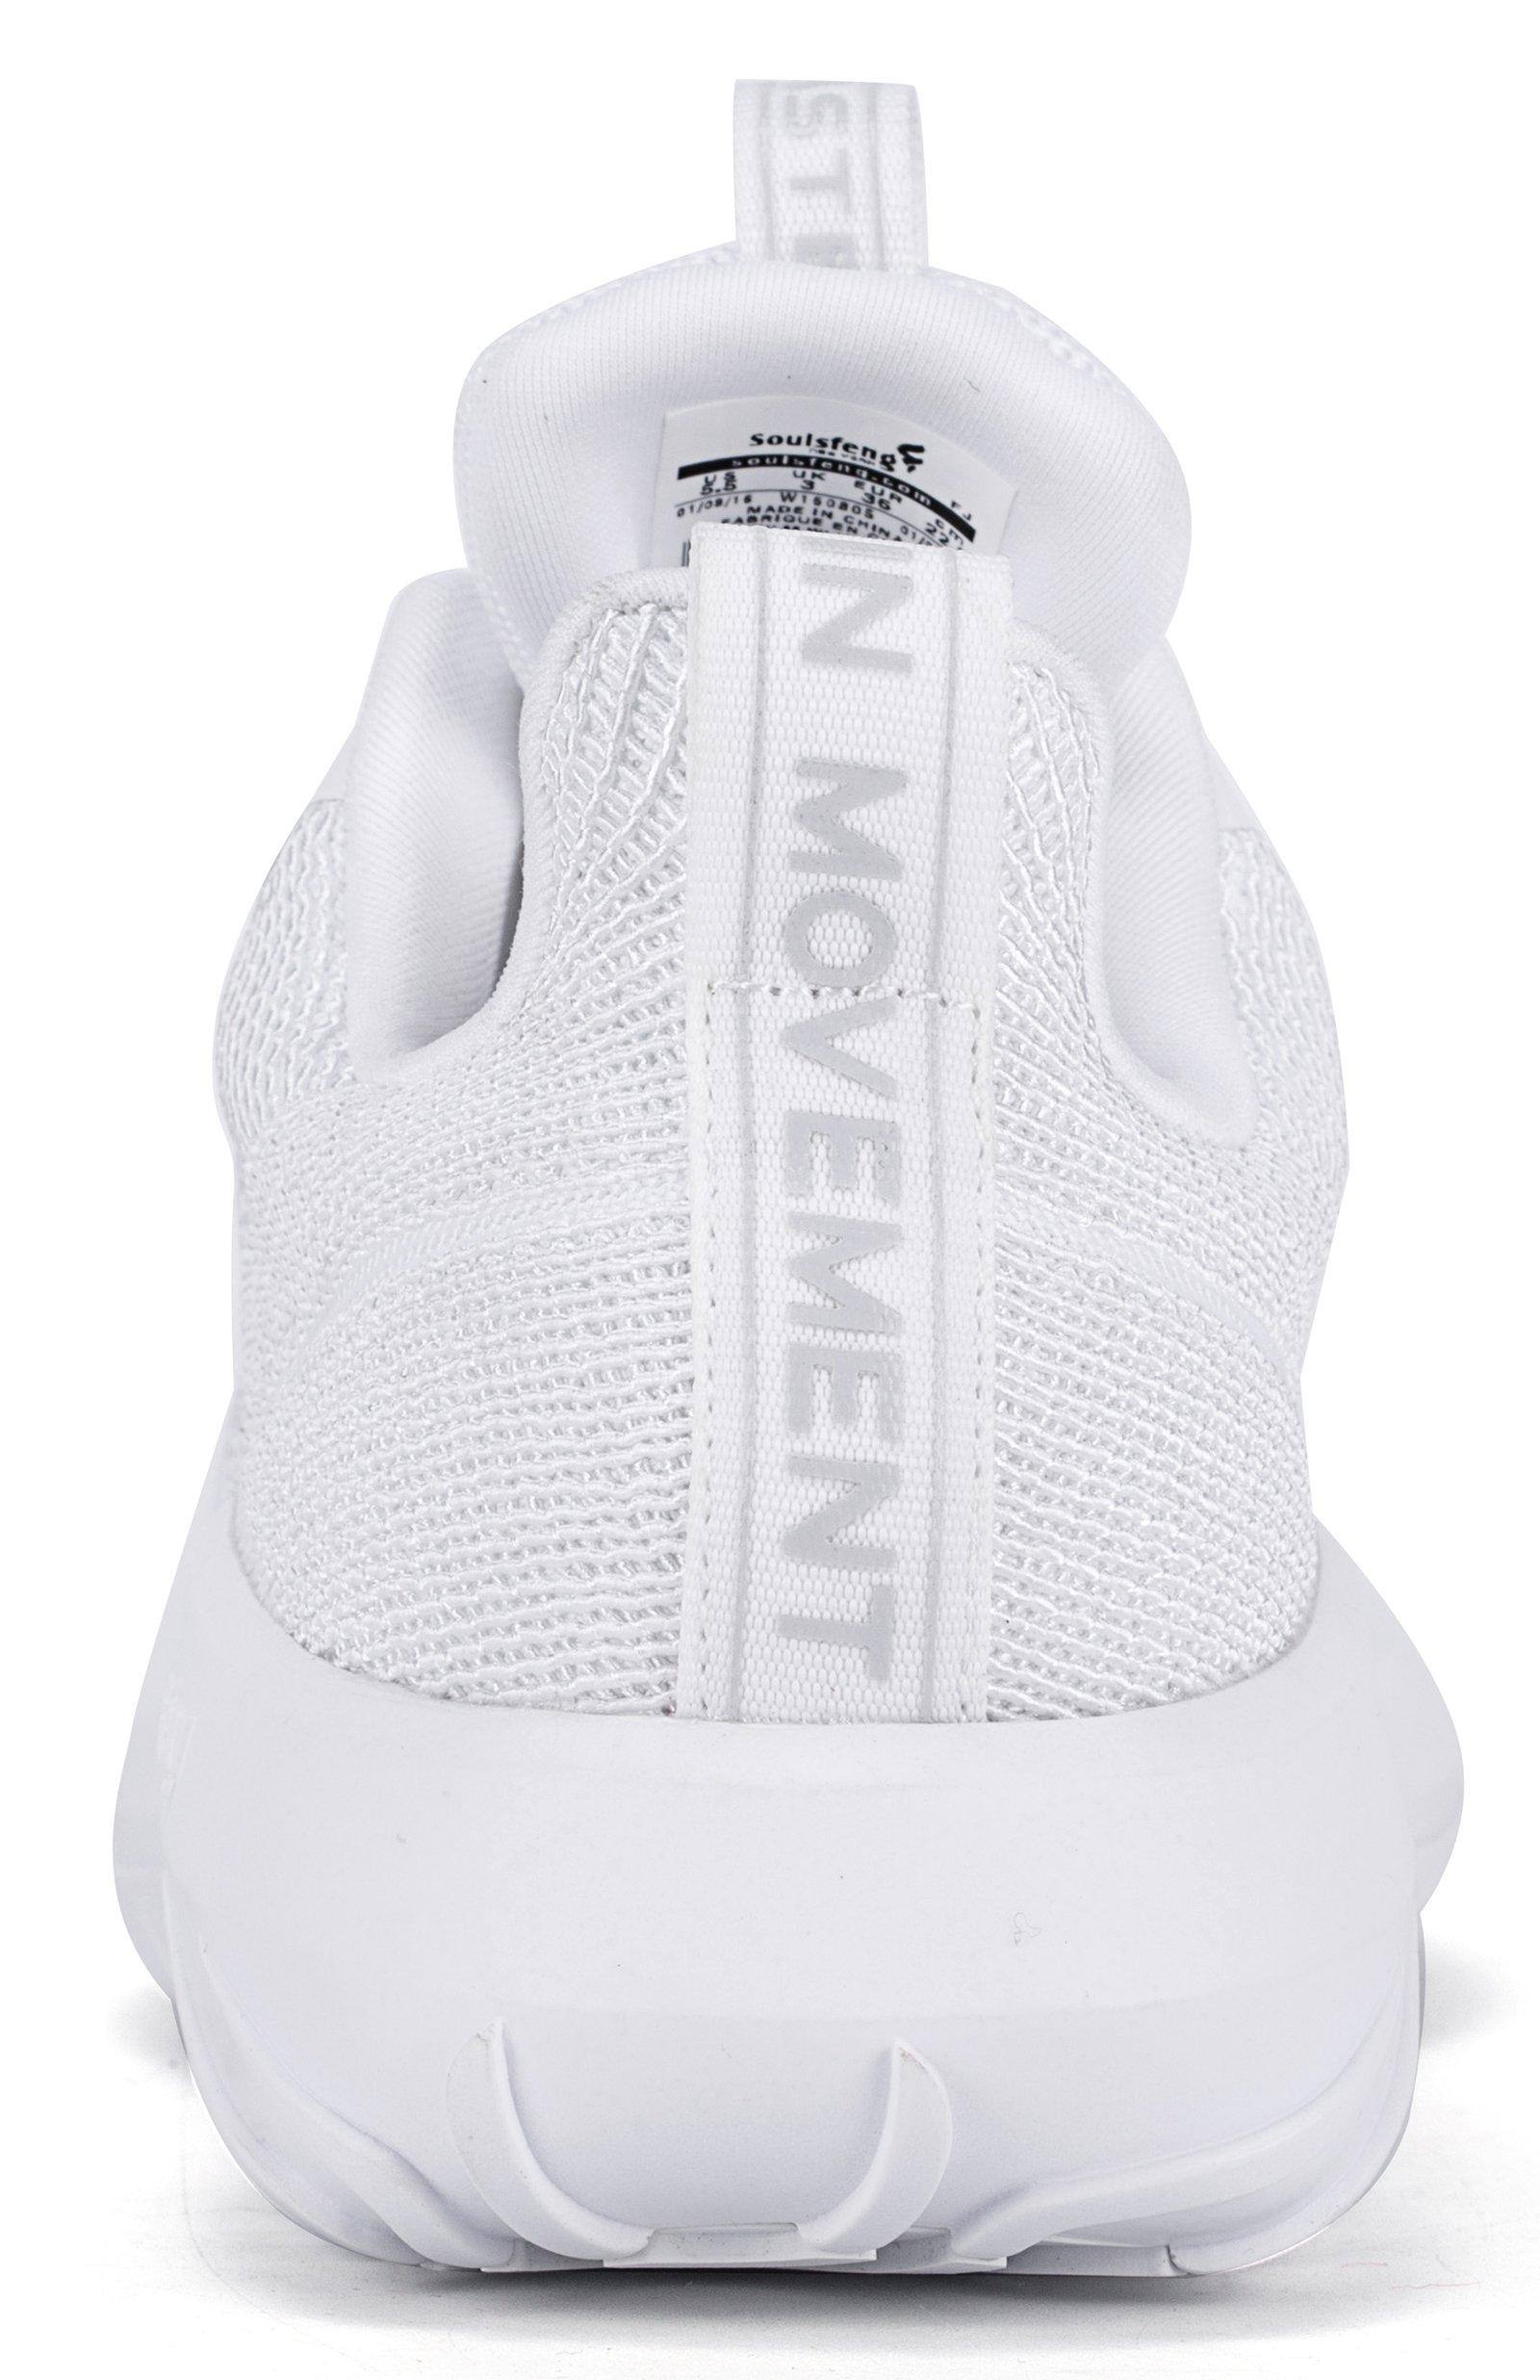 Soulsfeng Men Women Unisex Casual Fashion Sneakers Lightweight Breathable Athletic Sport Shoes (Men US8=EUR41=26CM, White)